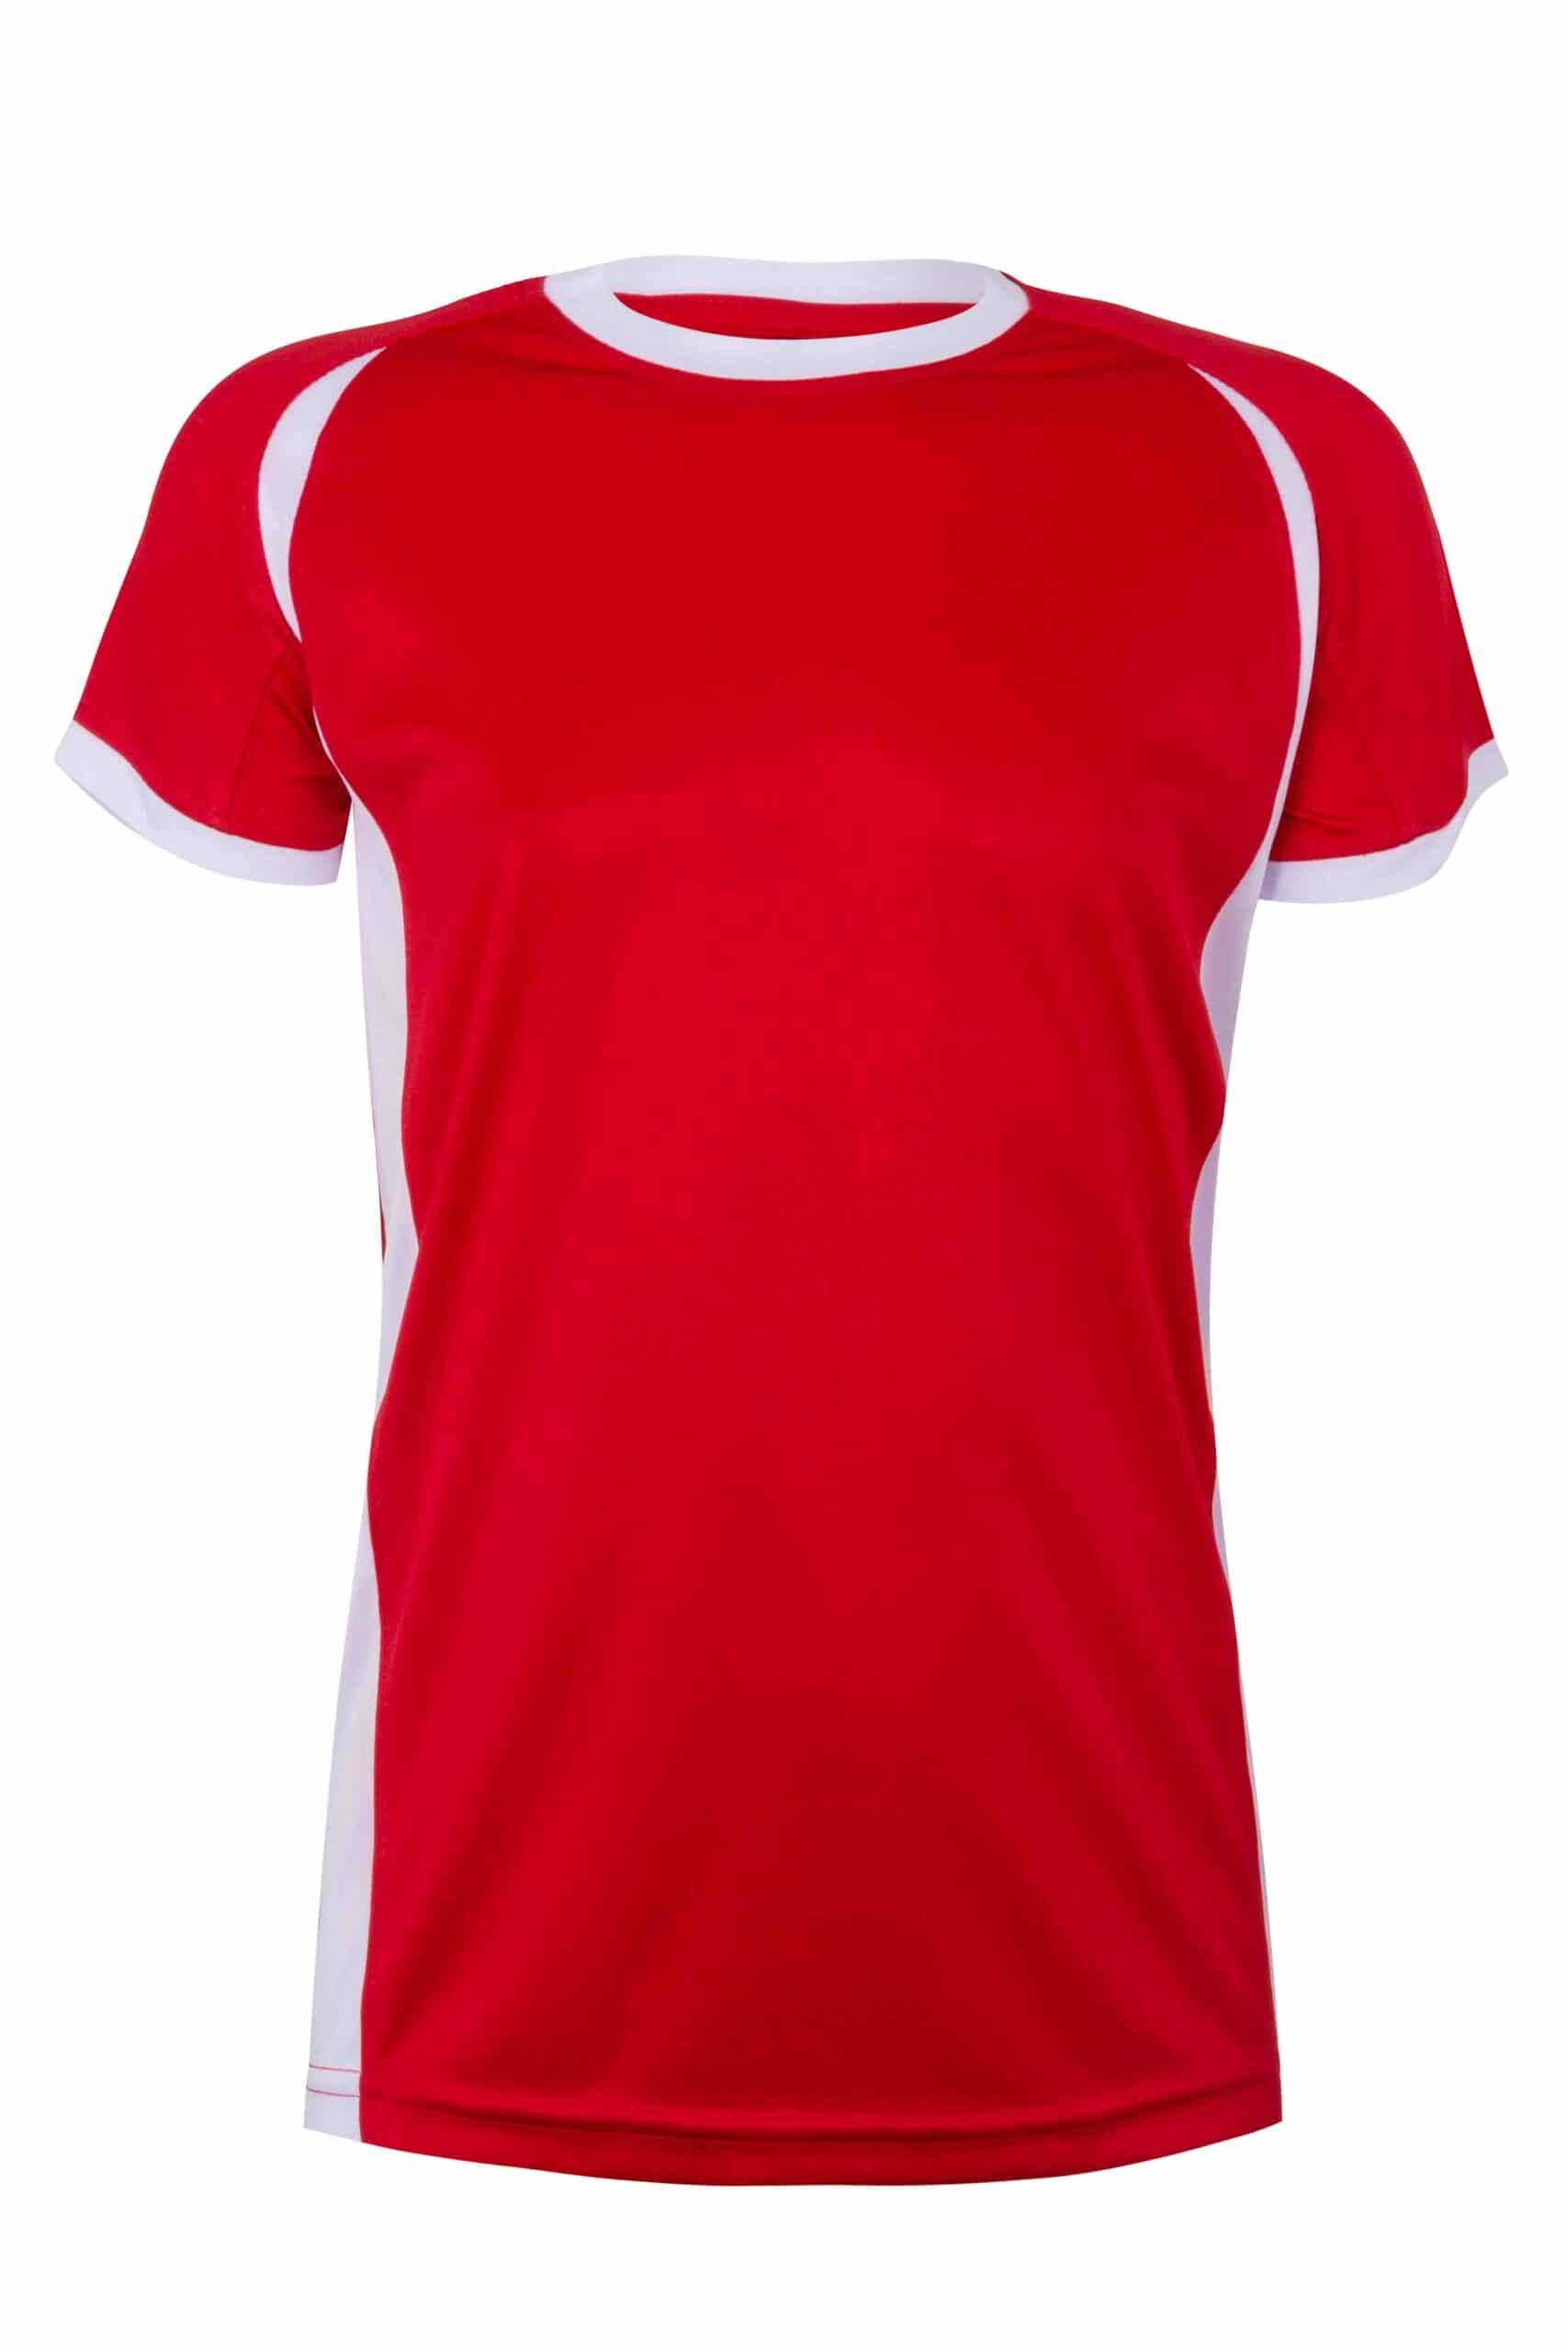 Mukua Mk531v Camiseta TÉcnica Manga Corta Bicolor NiÑo Red White 1